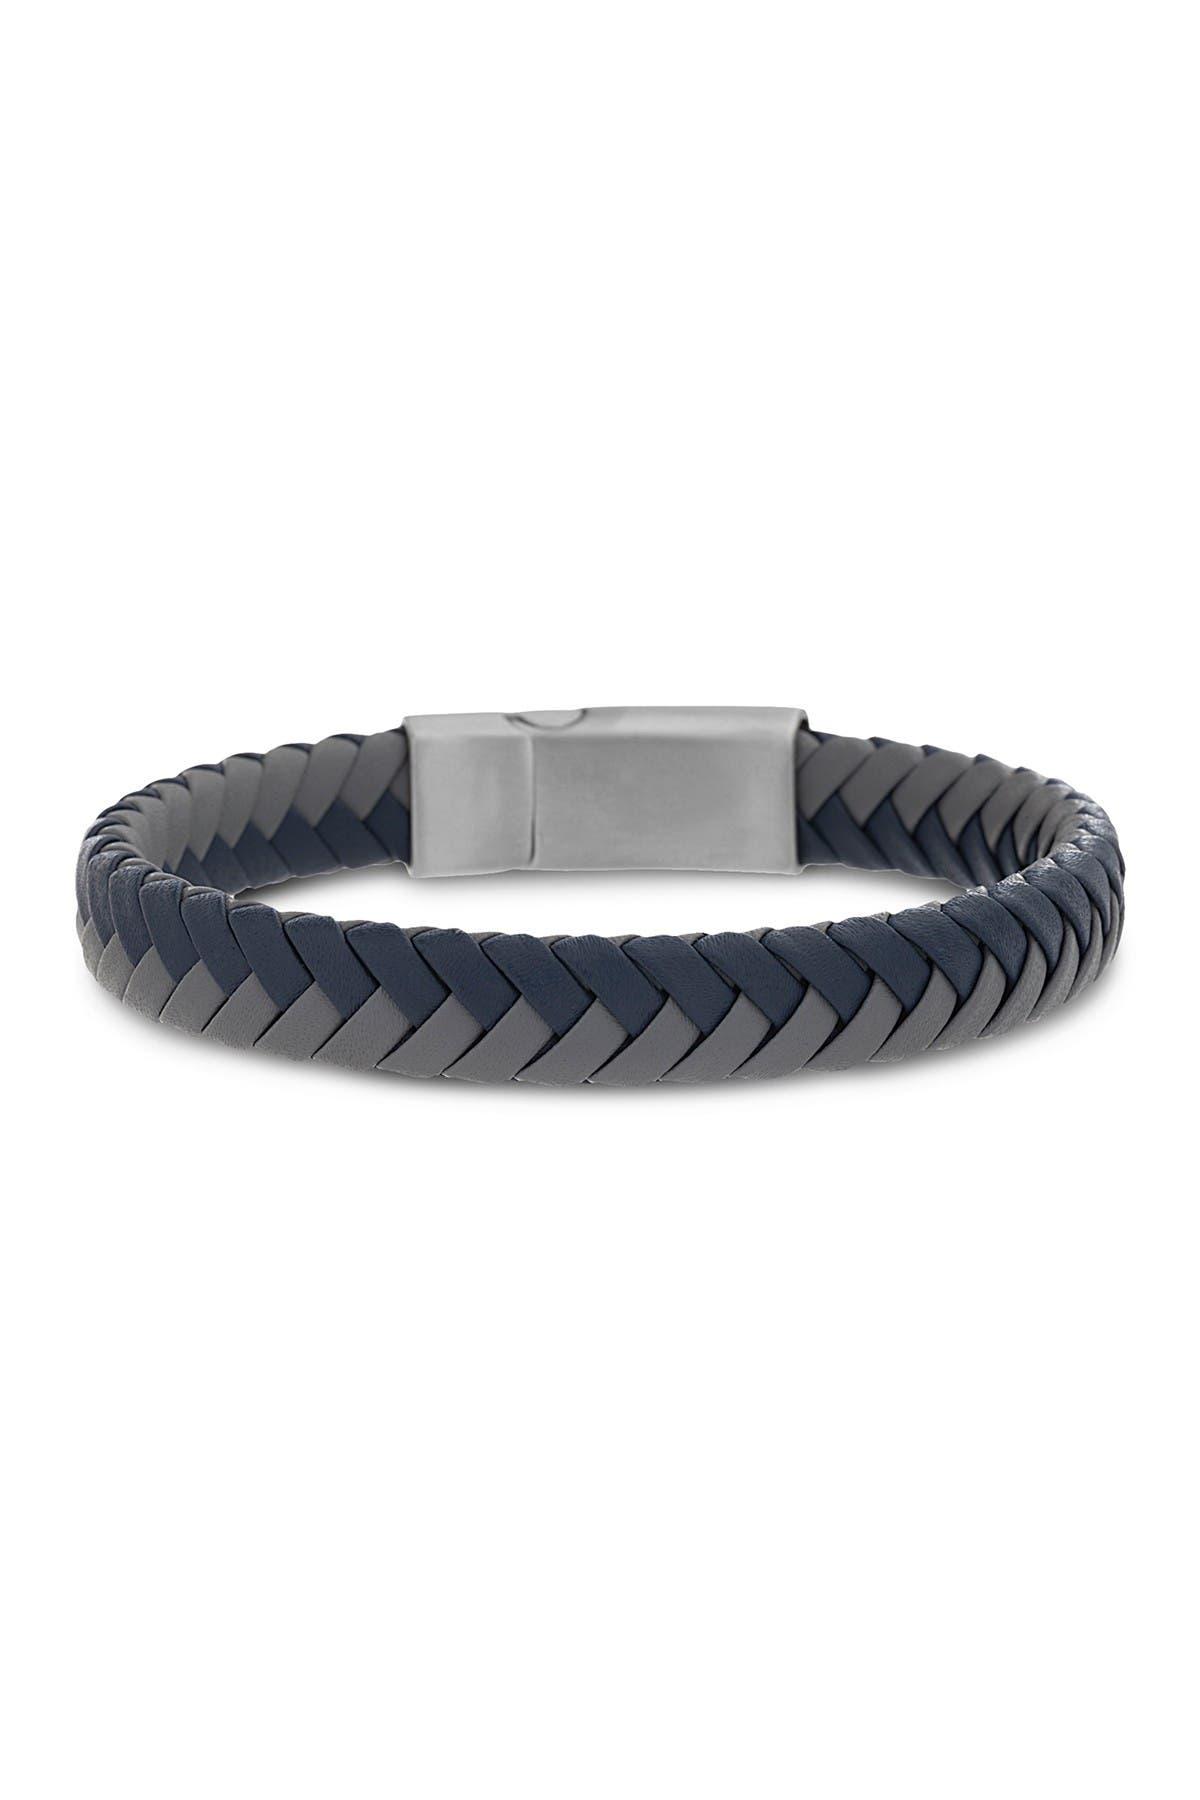 Image of Steve Madden Blue and Grey Braided Leather Bracelet